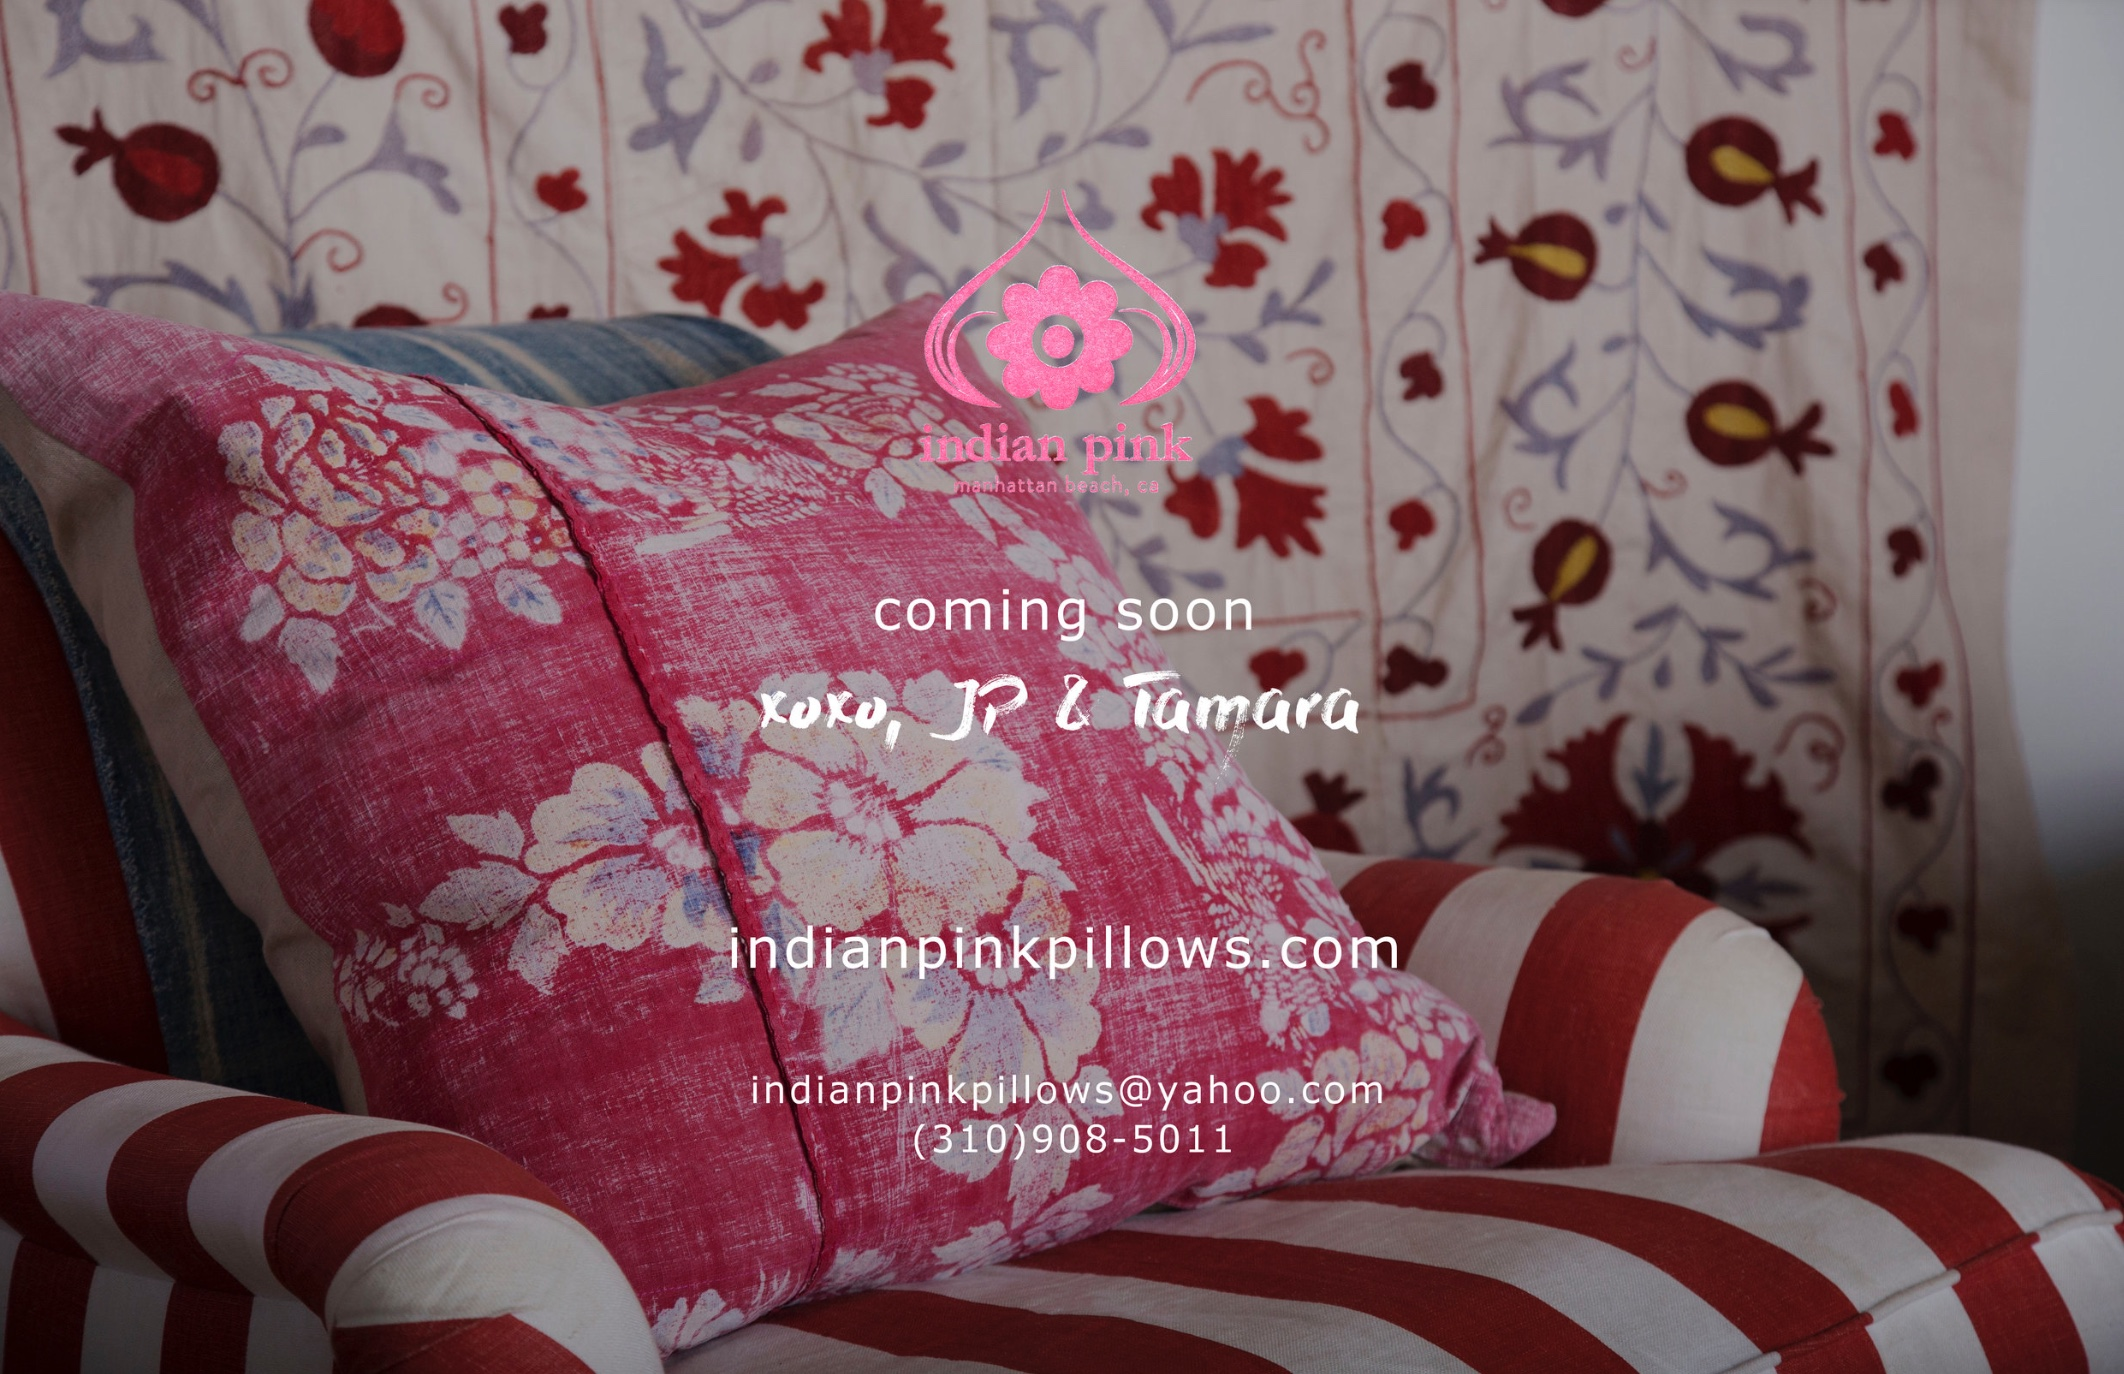 indian pink pillows coming soon.jpg